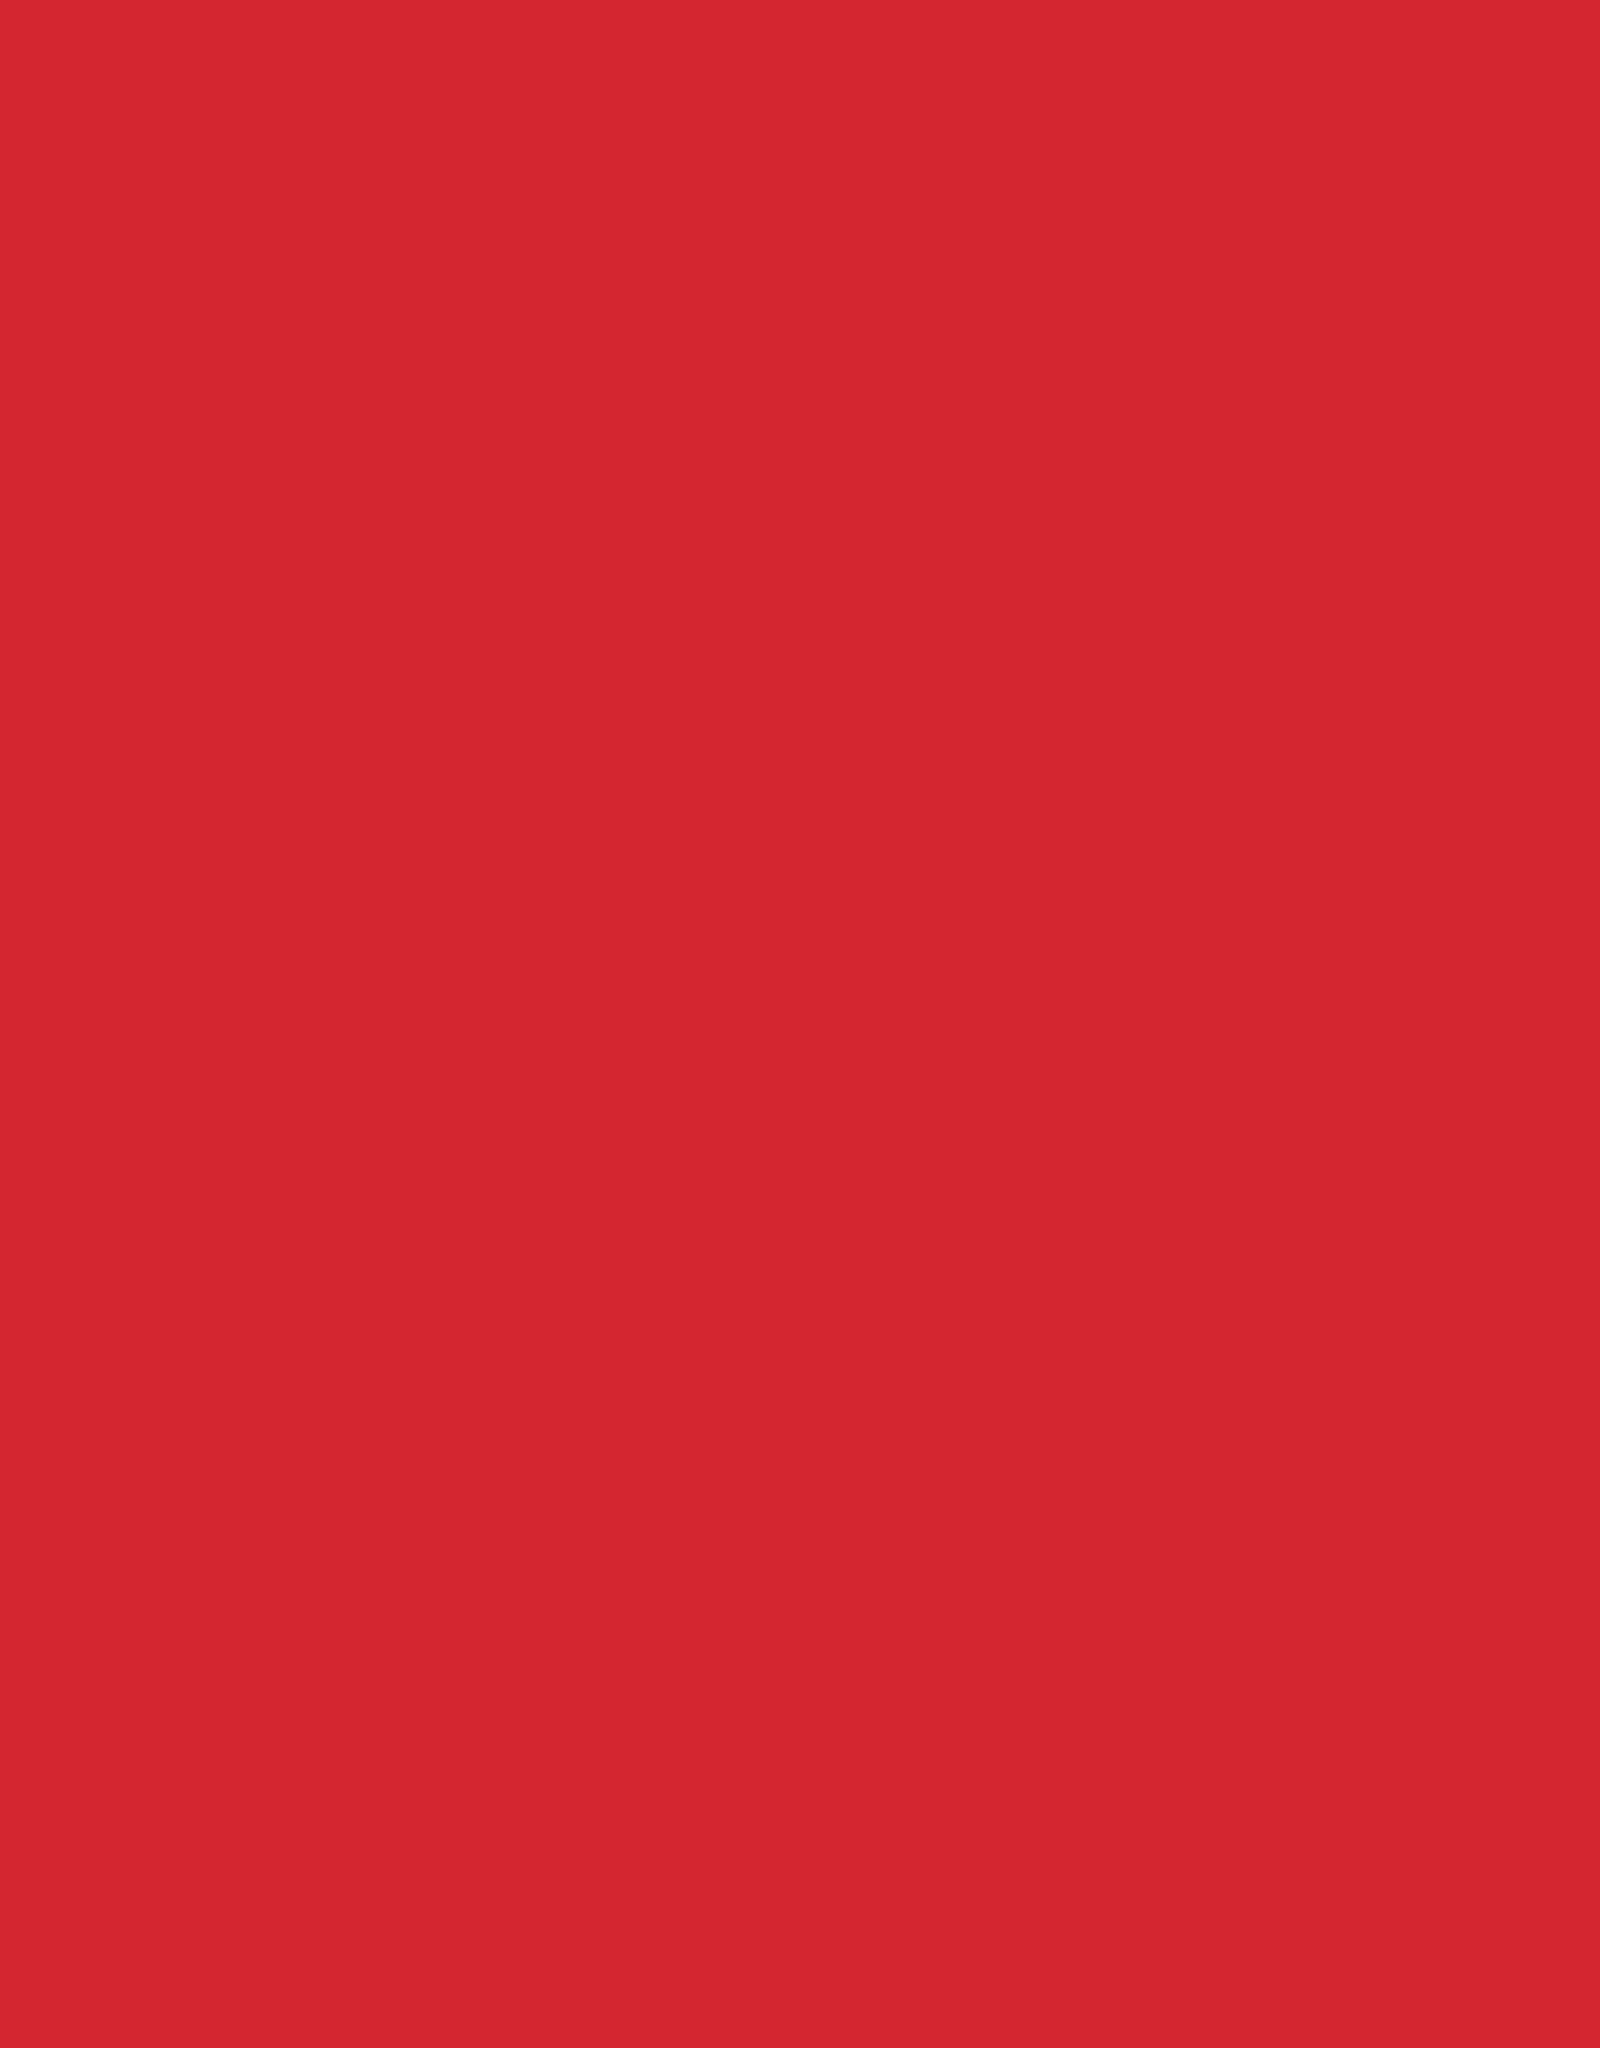 Jacquard Solarfast Scarlet Large